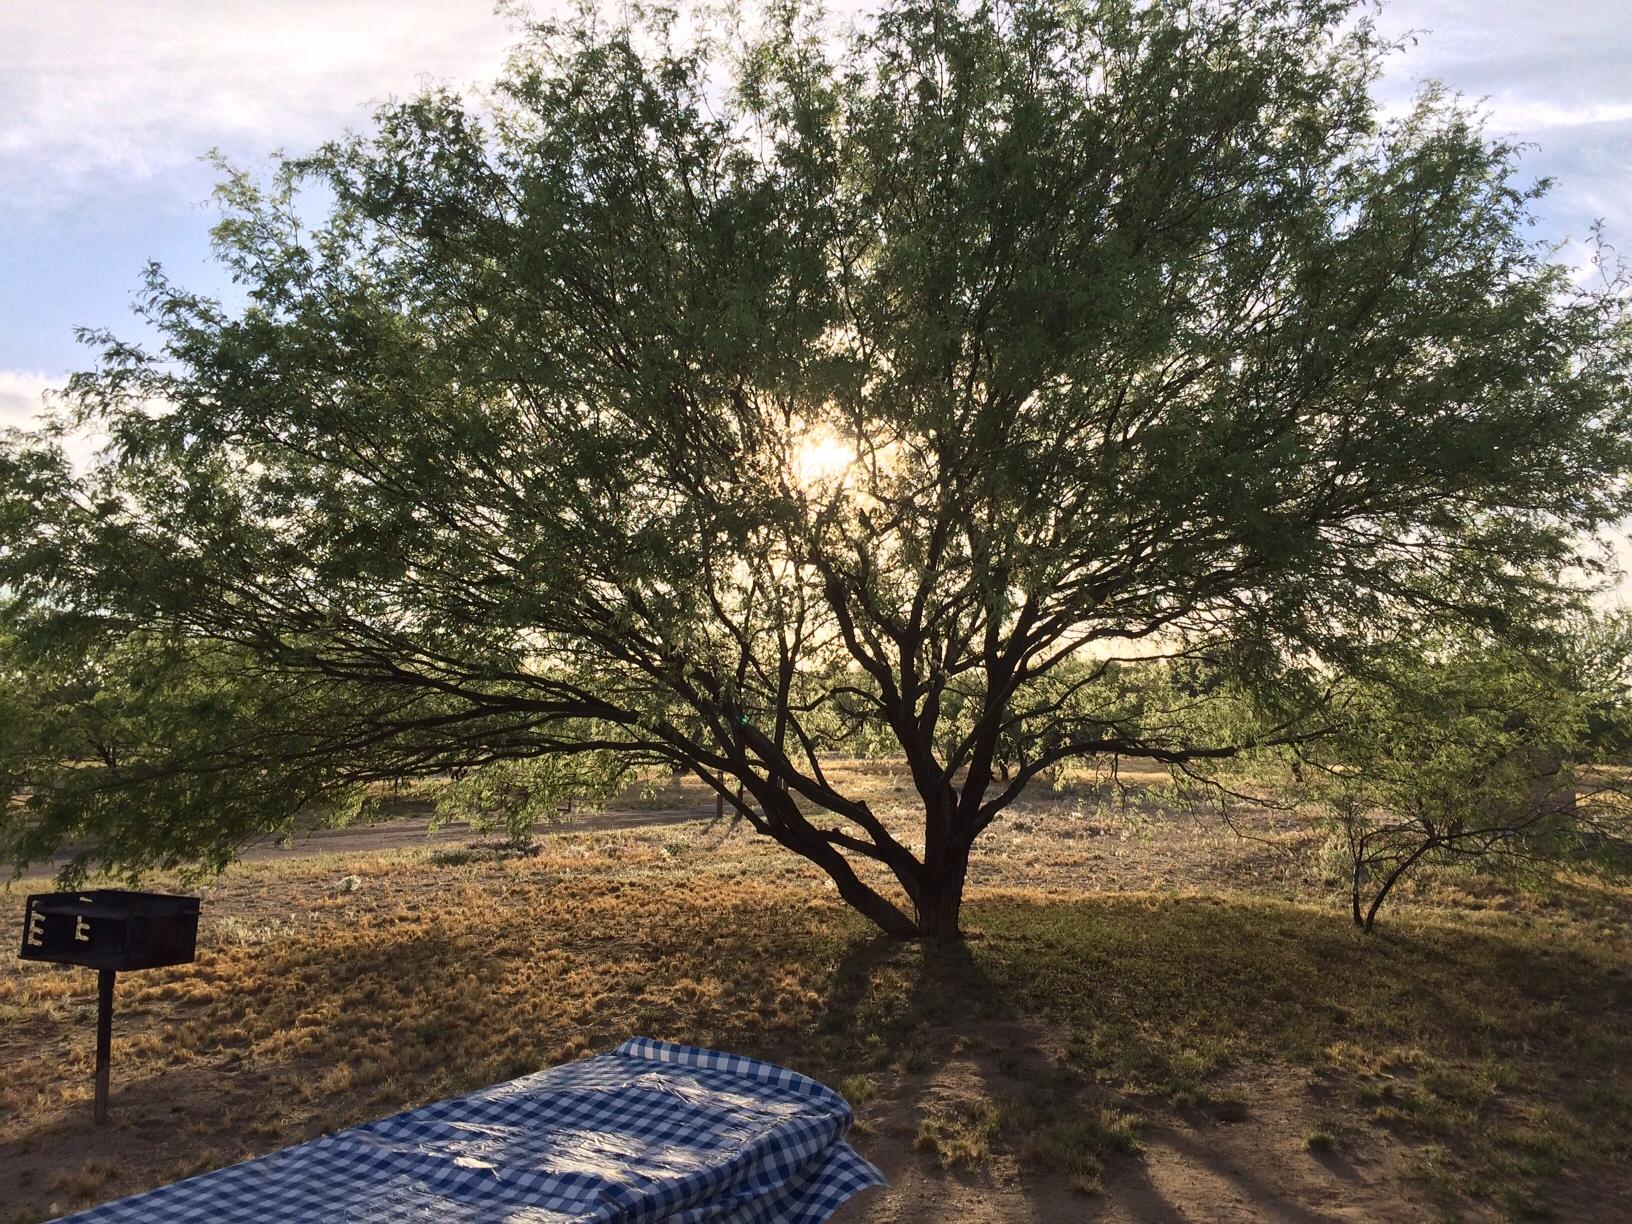 Sun setting through the tree